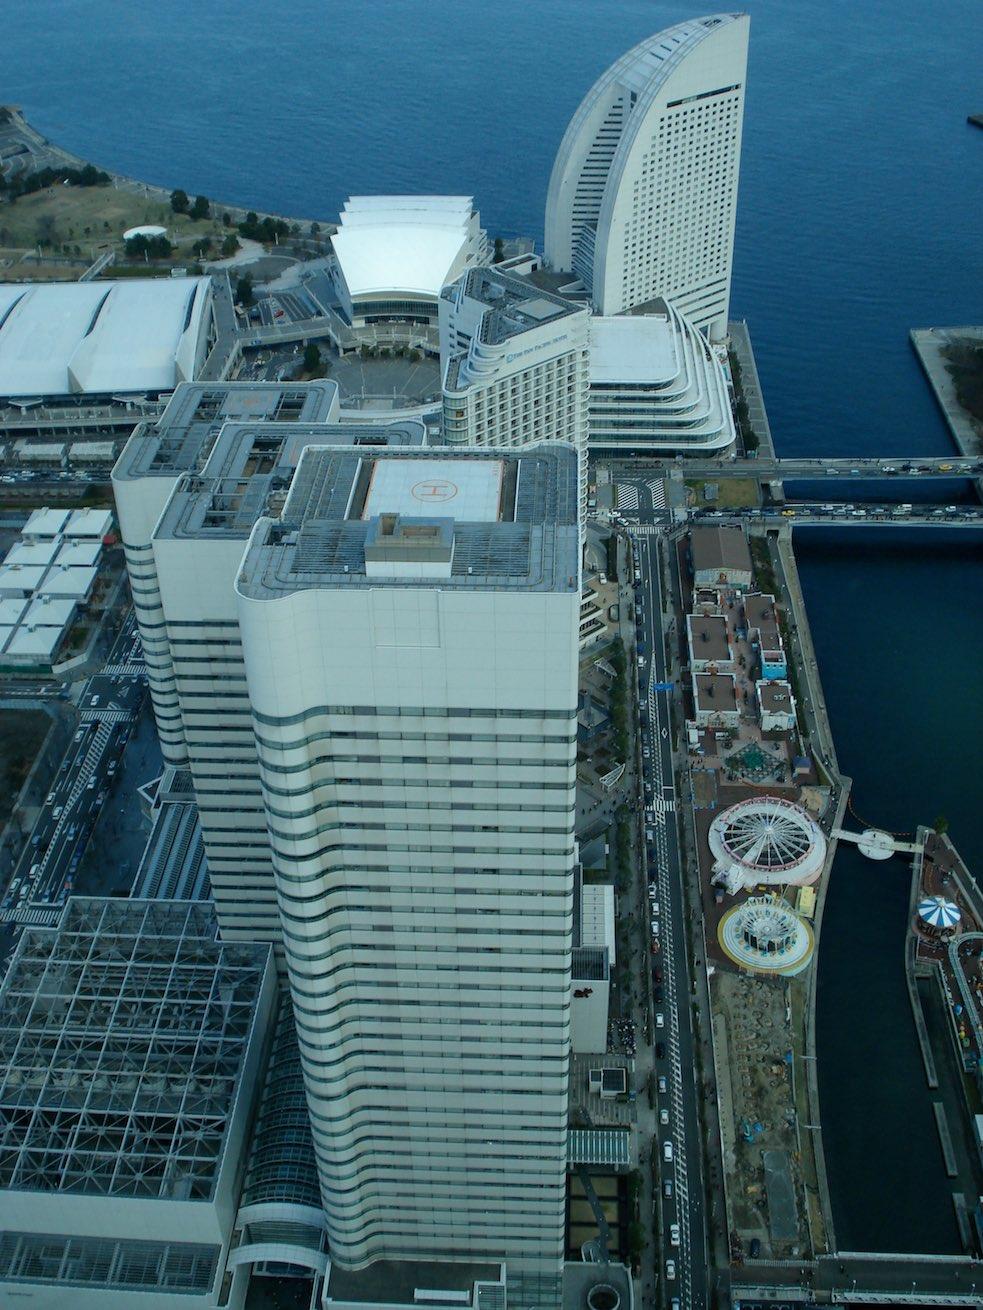 Yokohama Landmark Tower | Next Stop, Japan